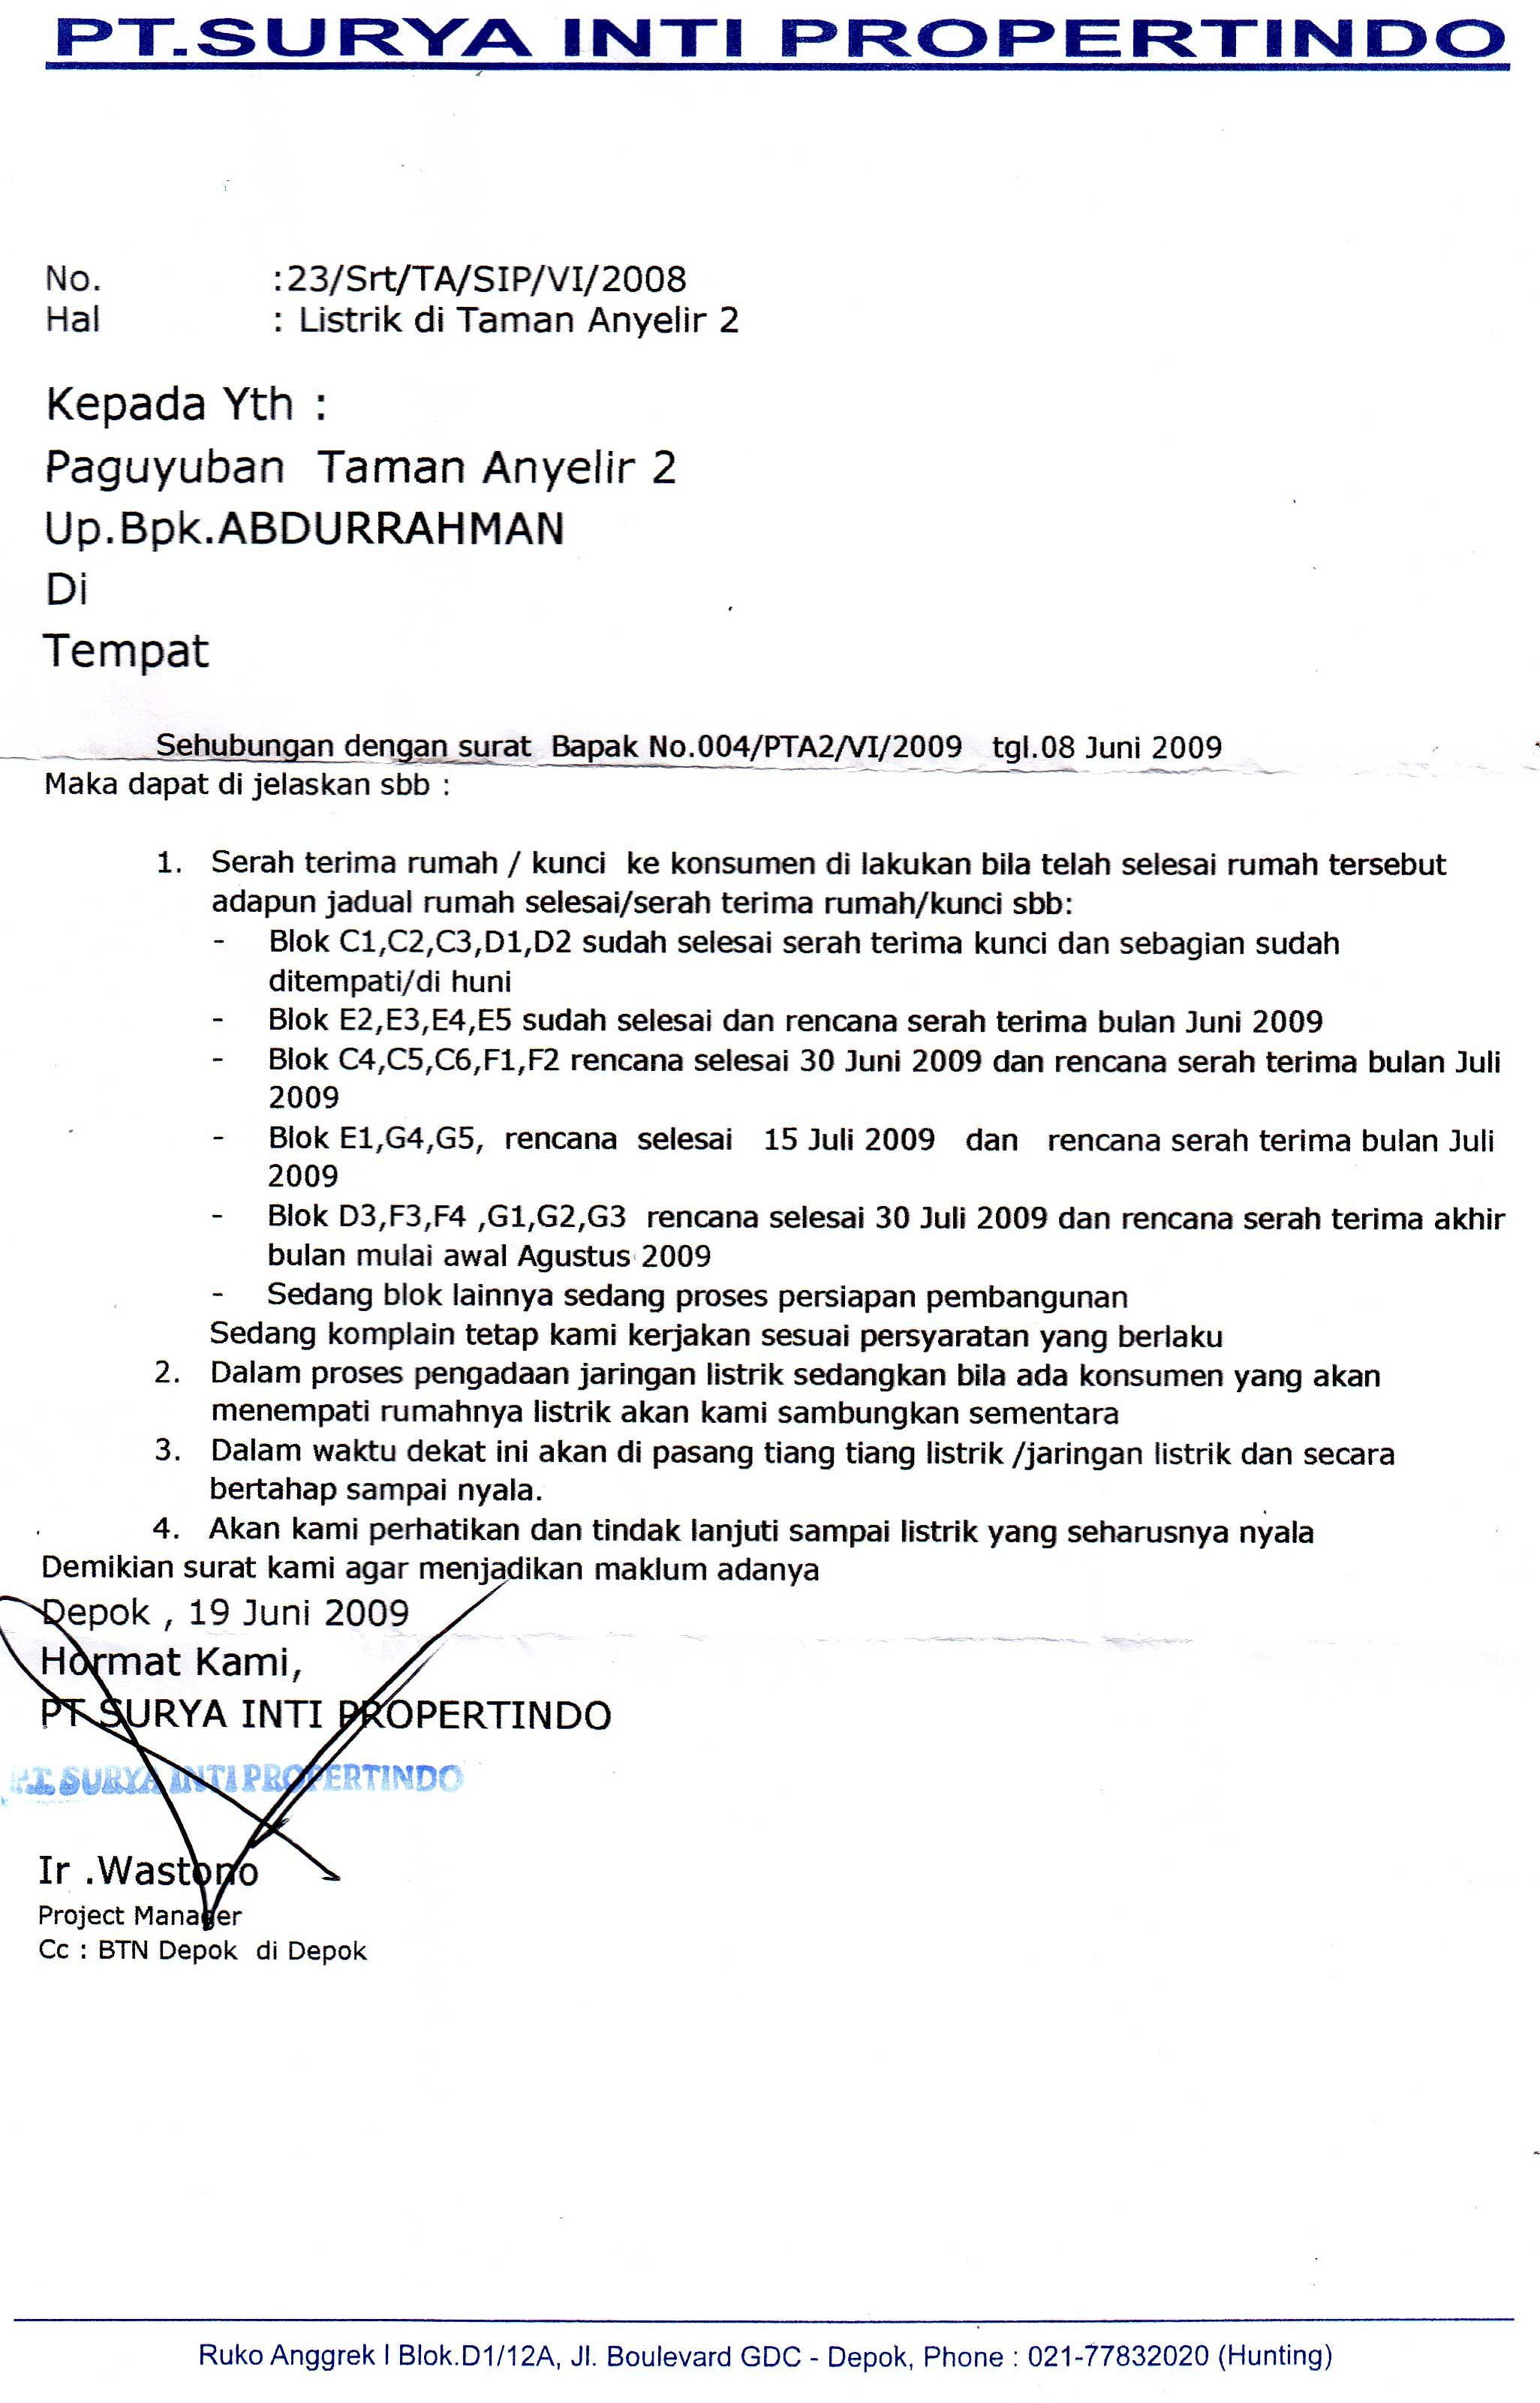 Business Letter Format Philippines  Sample Business Letter